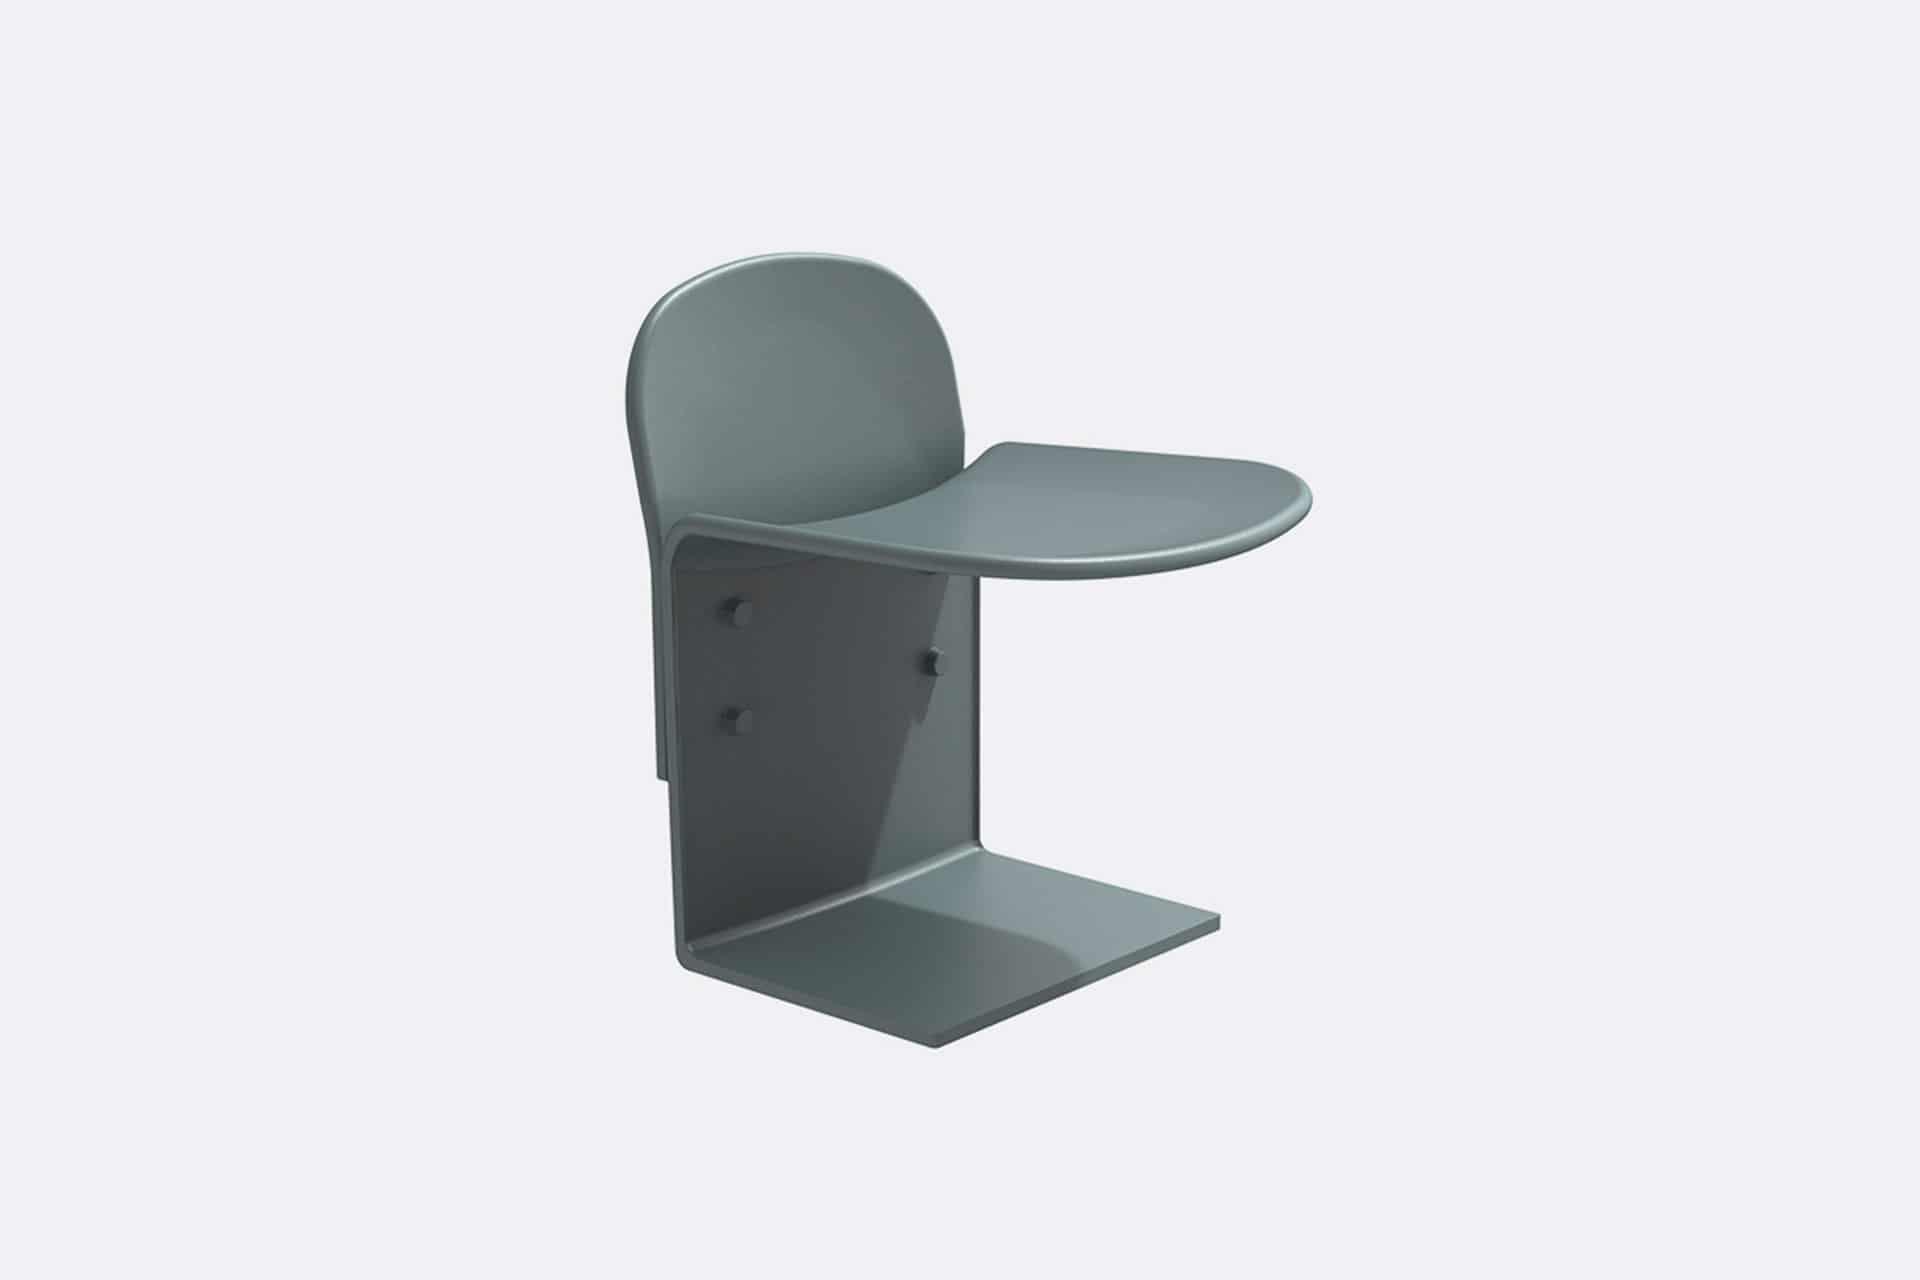 UrbanObjekts Cais Sitzgelegenheit mit Rückenstütze